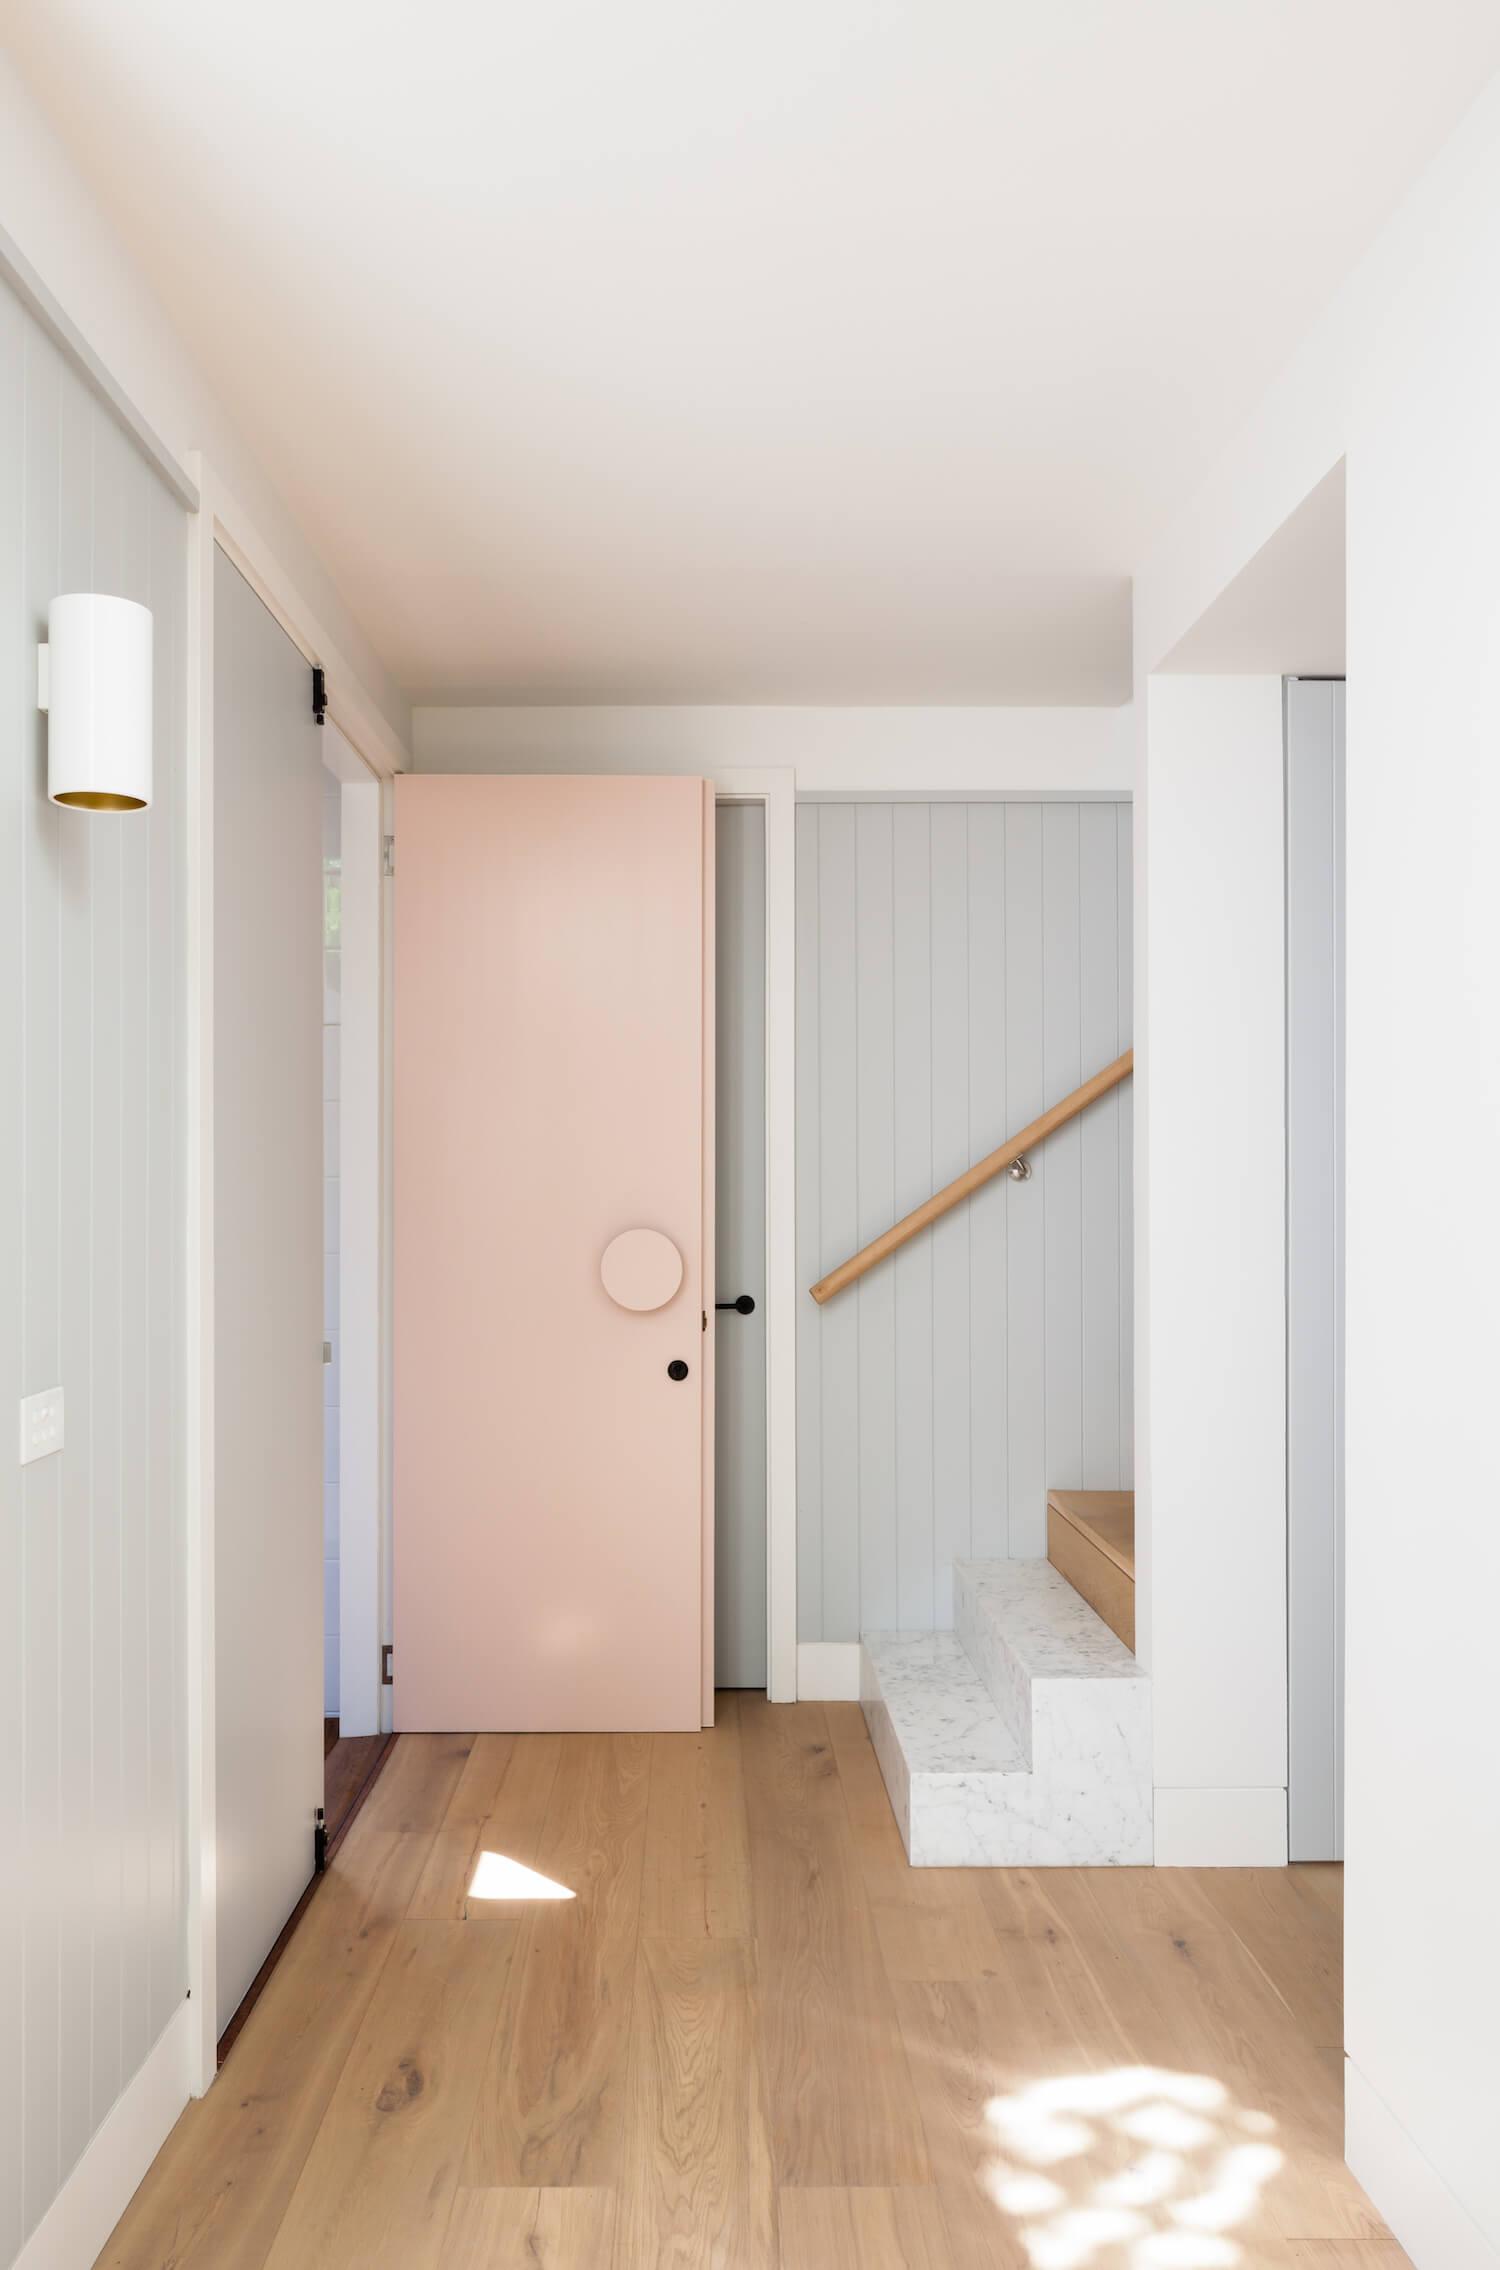 est living interiors simple geometry 7